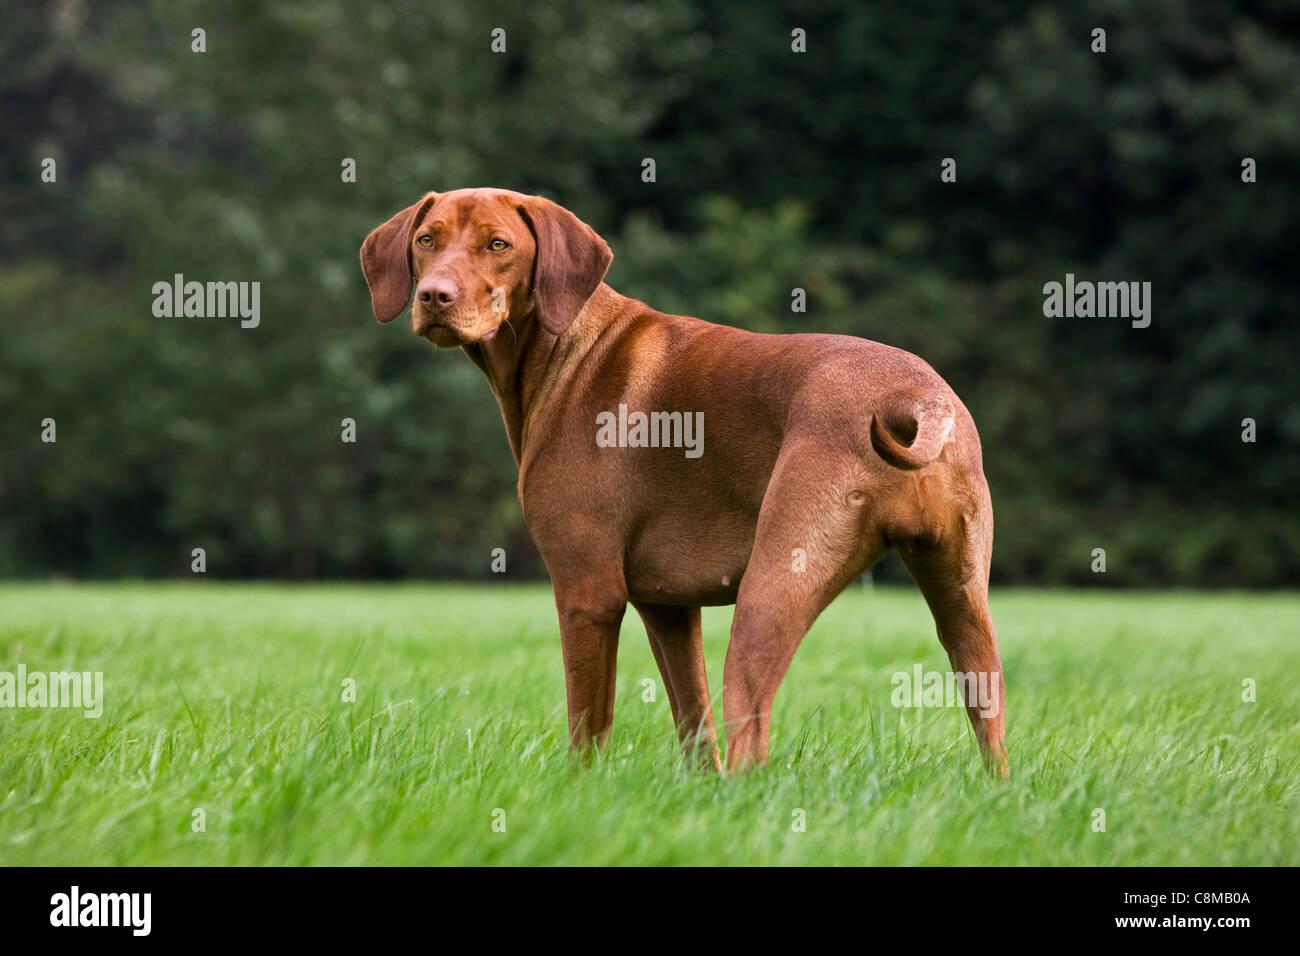 Cane Da Caccia Immagini Cane Da Caccia Fotos Stock Alamy